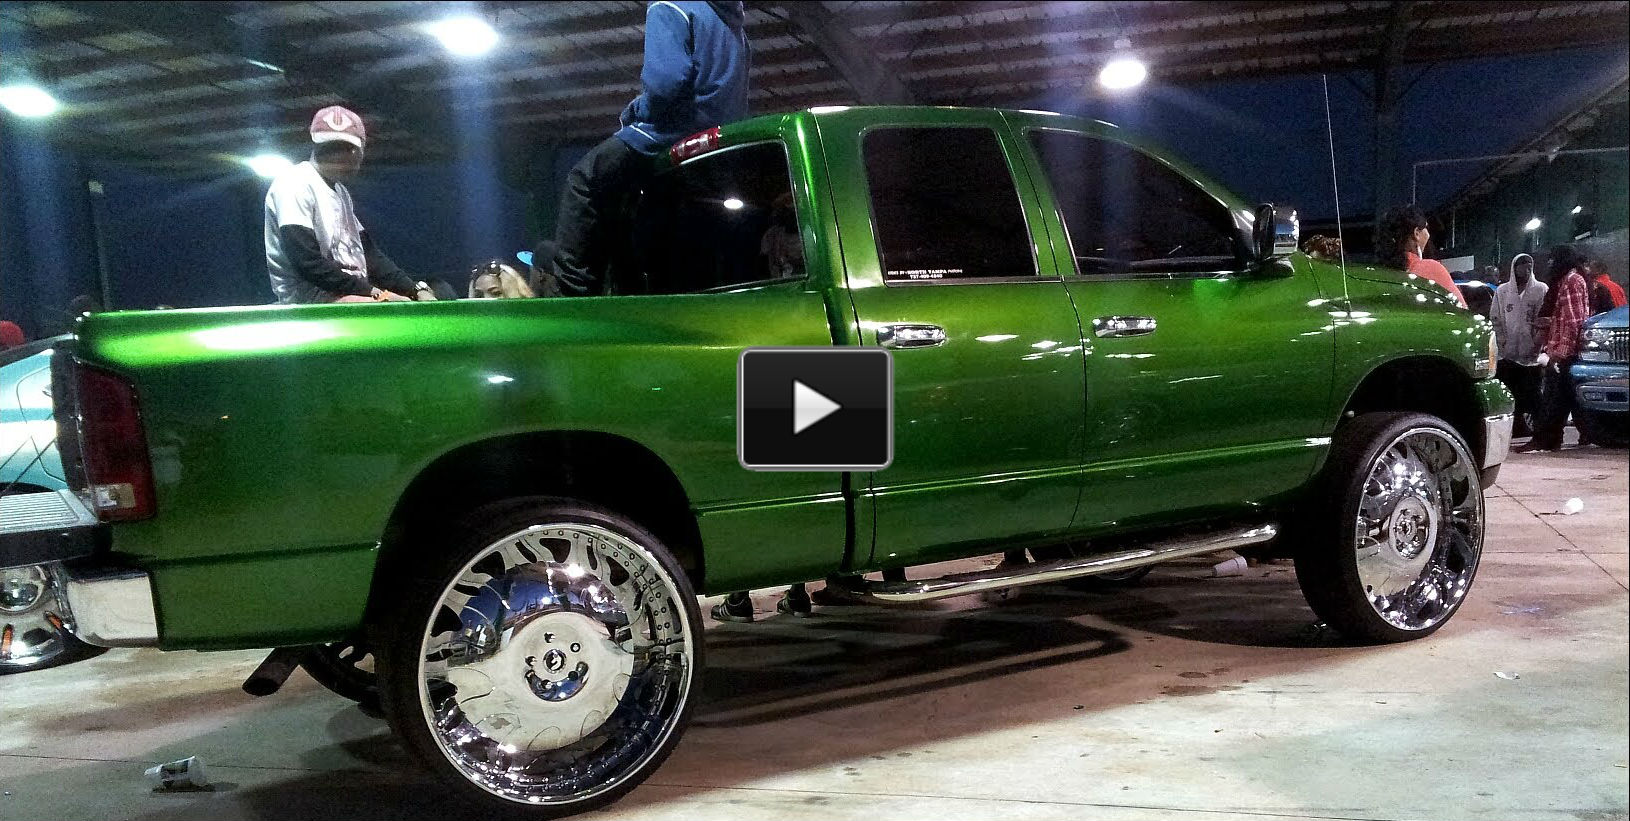 Monster Truck Rc Cars >> Kandy Green Dodge Ram on 32 inch Forgiato Rims!